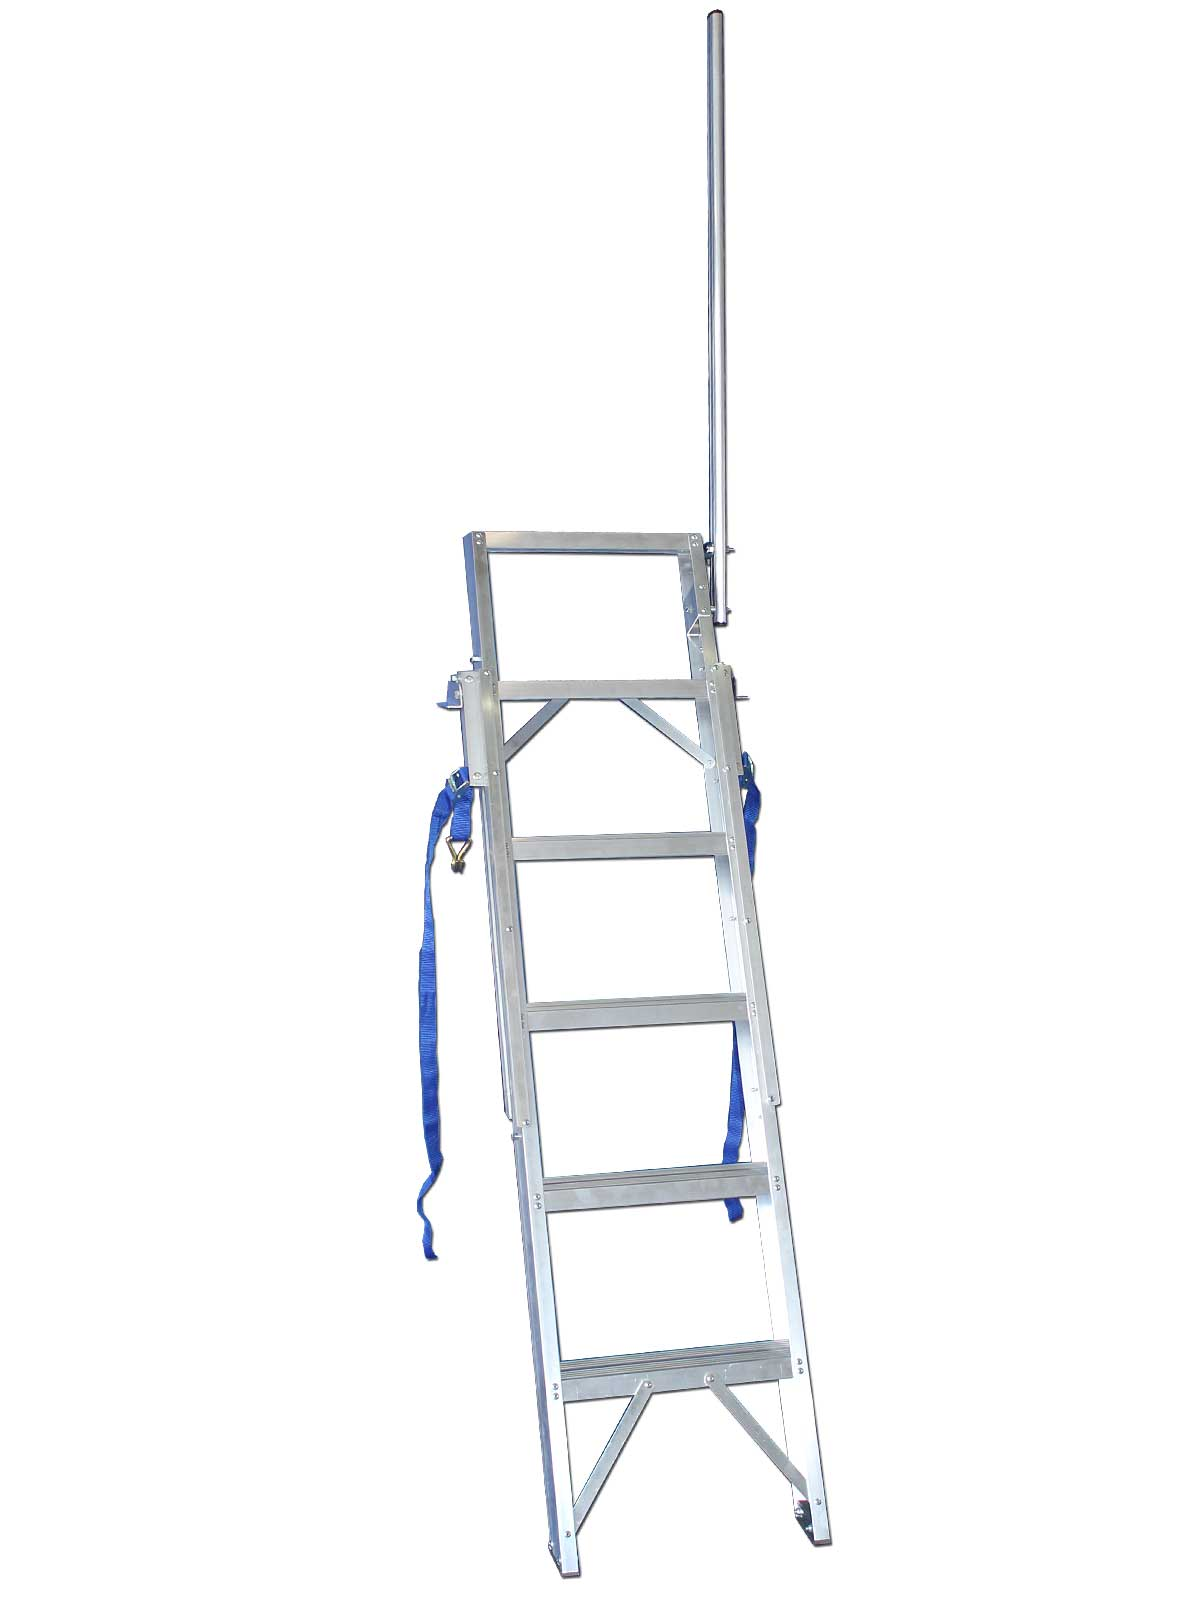 Vehicle Bed Ladder